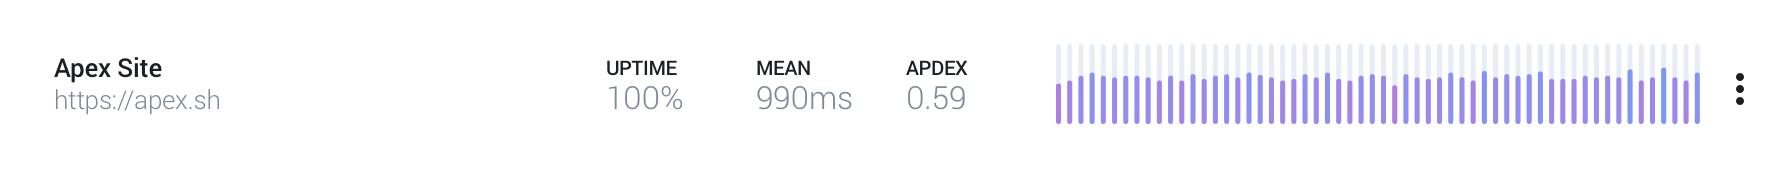 Apdex at 500ms